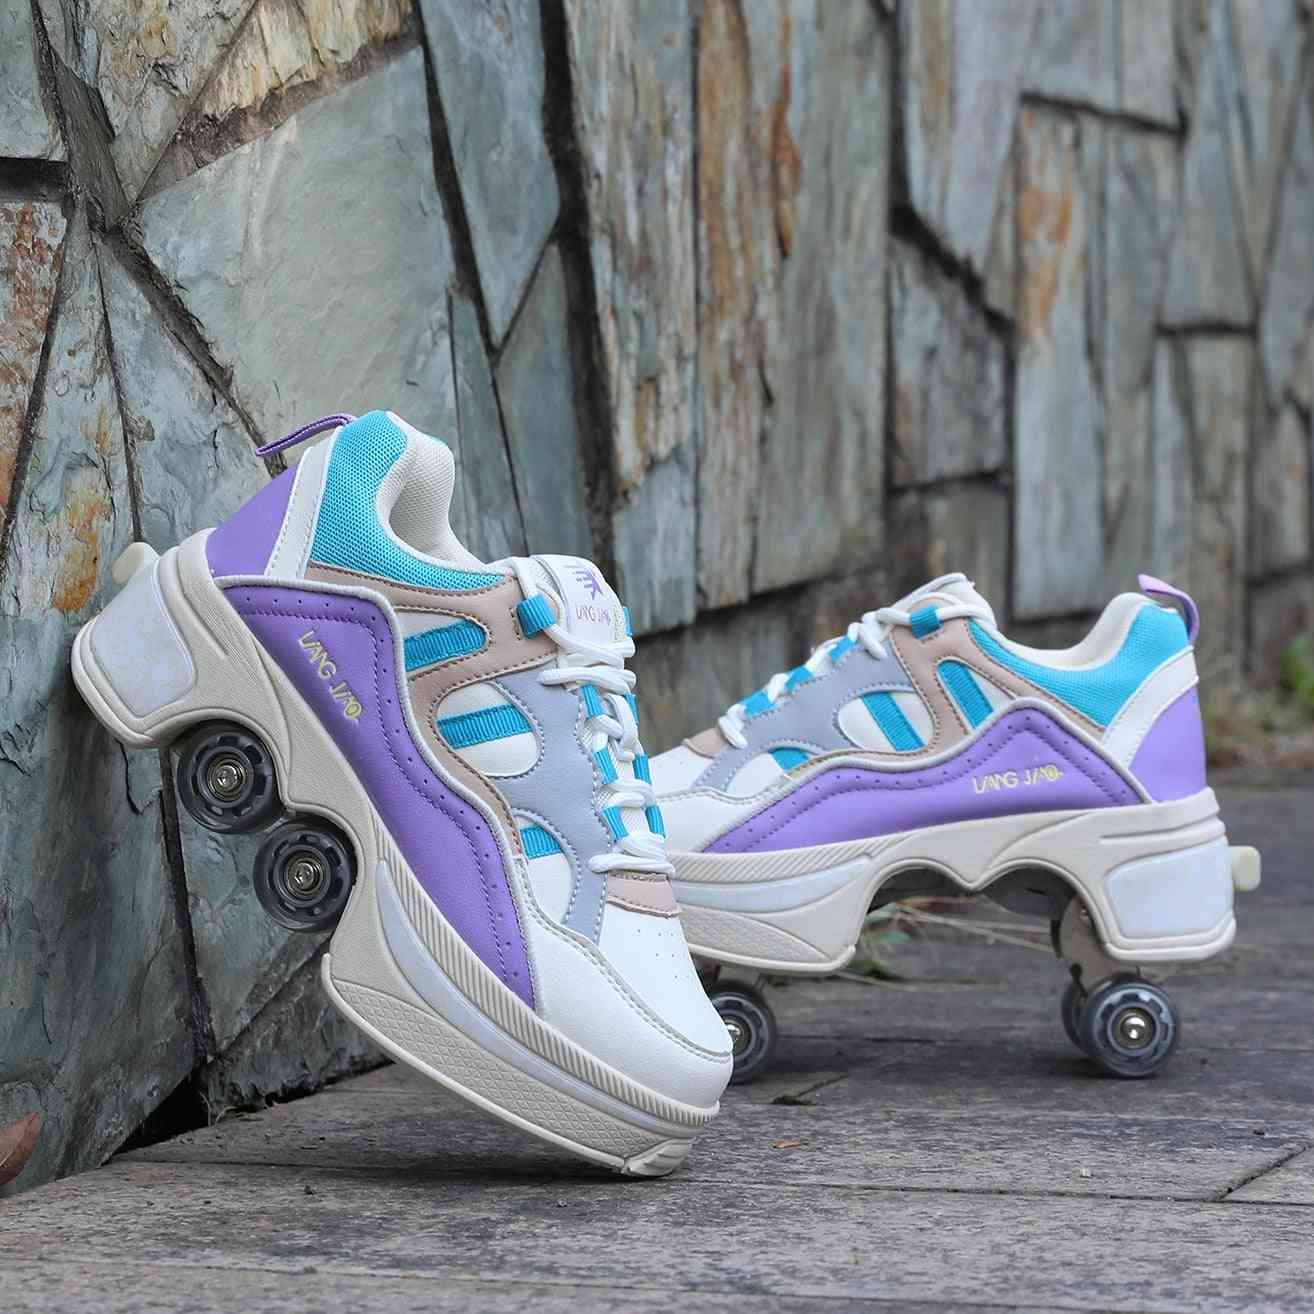 Leather 4 Wheels Double Line Roller Skates Shoes - Purple